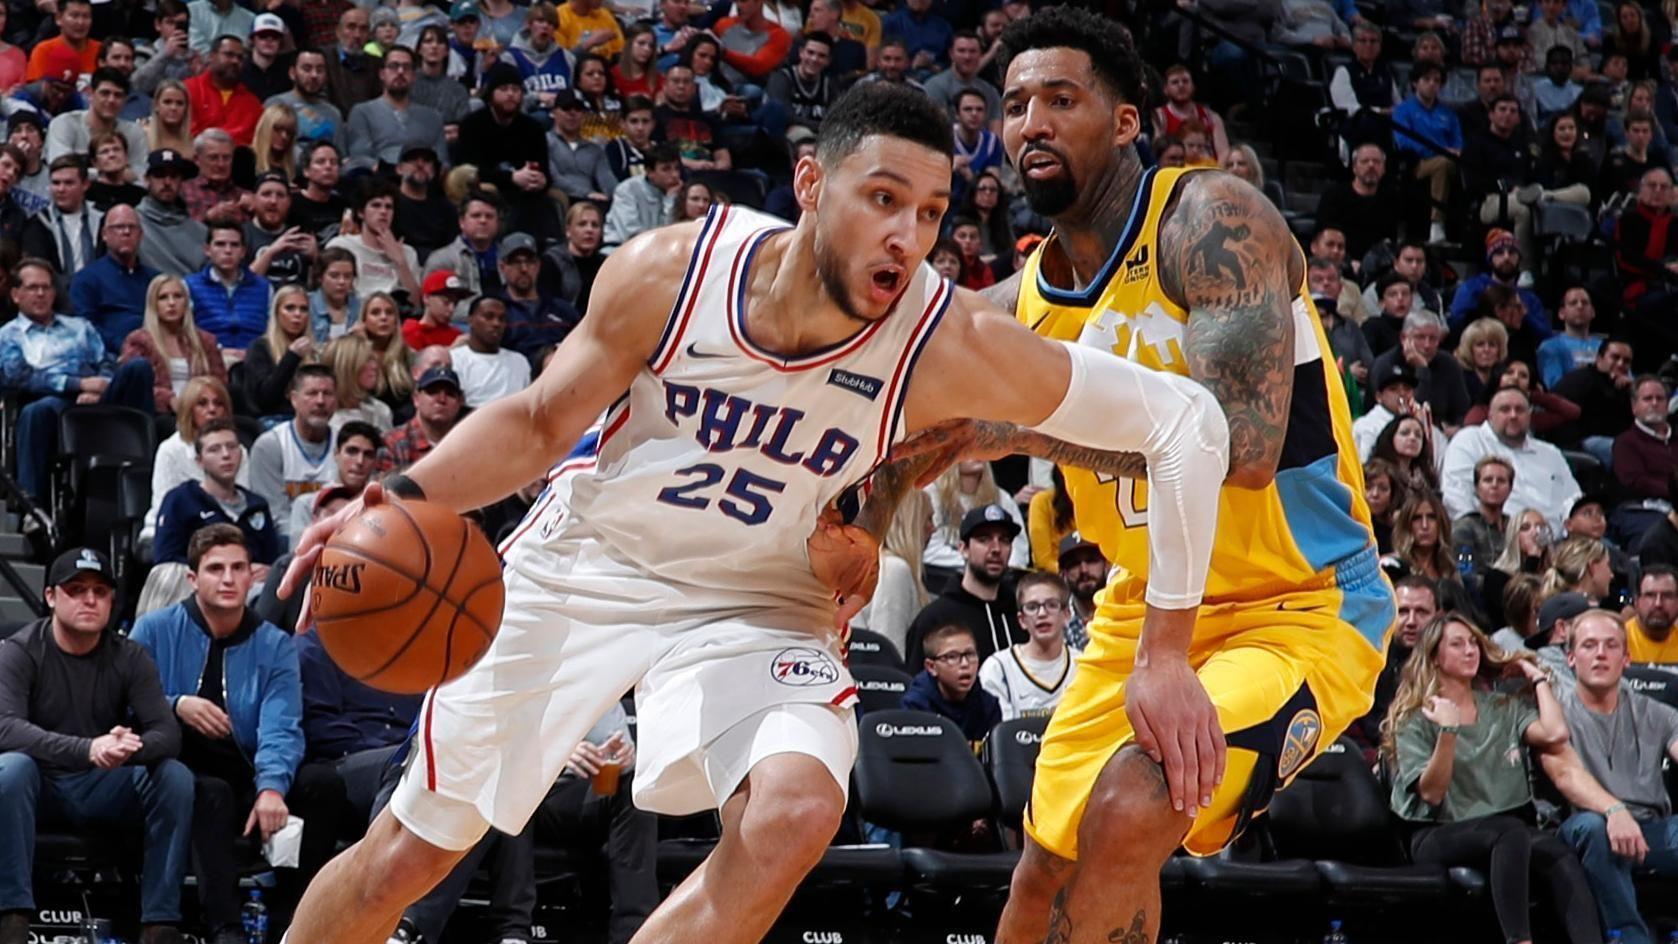 Balanced 76ers edge Nuggets ESPN Video Espn, Sports